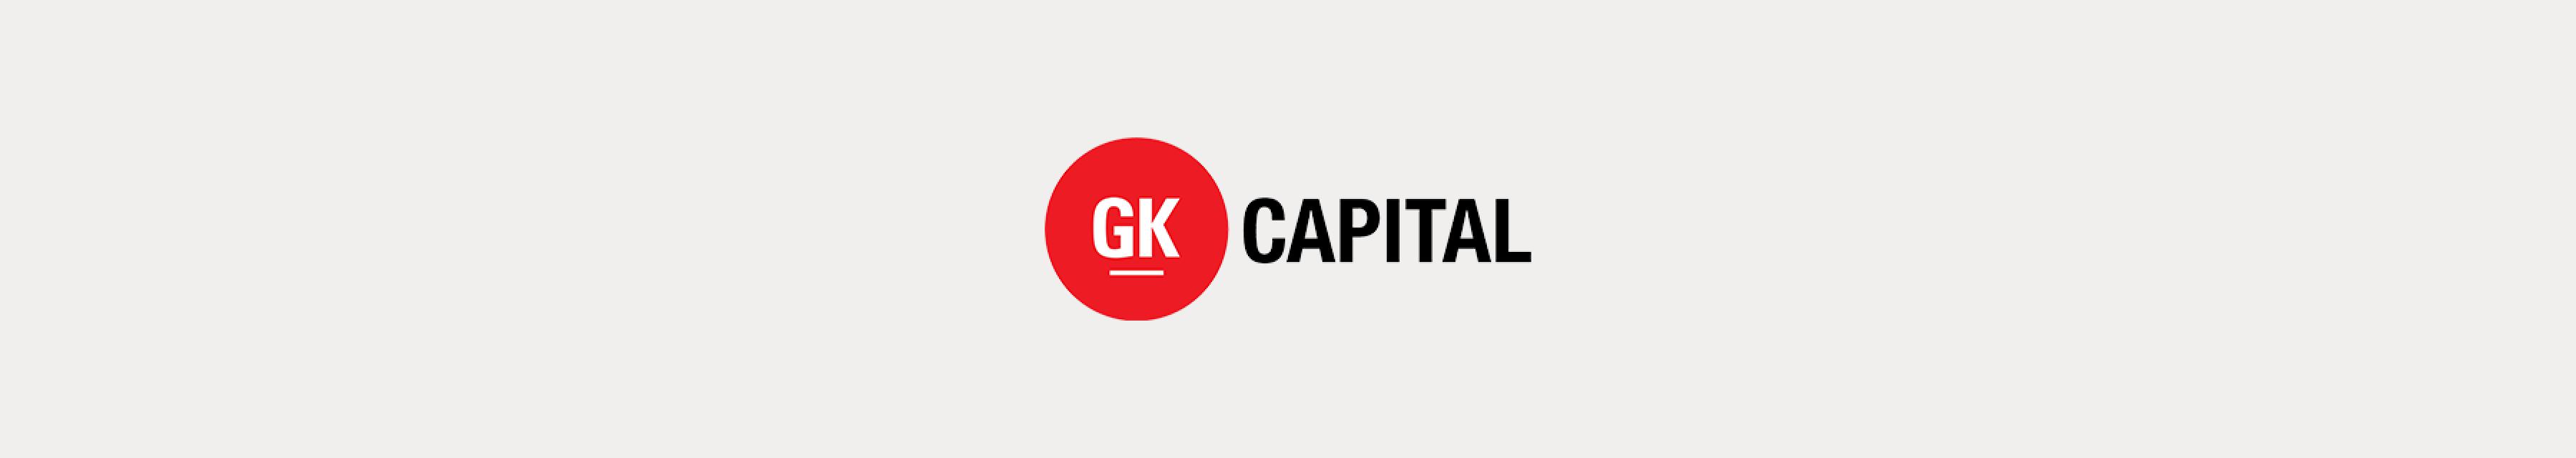 GK Capital